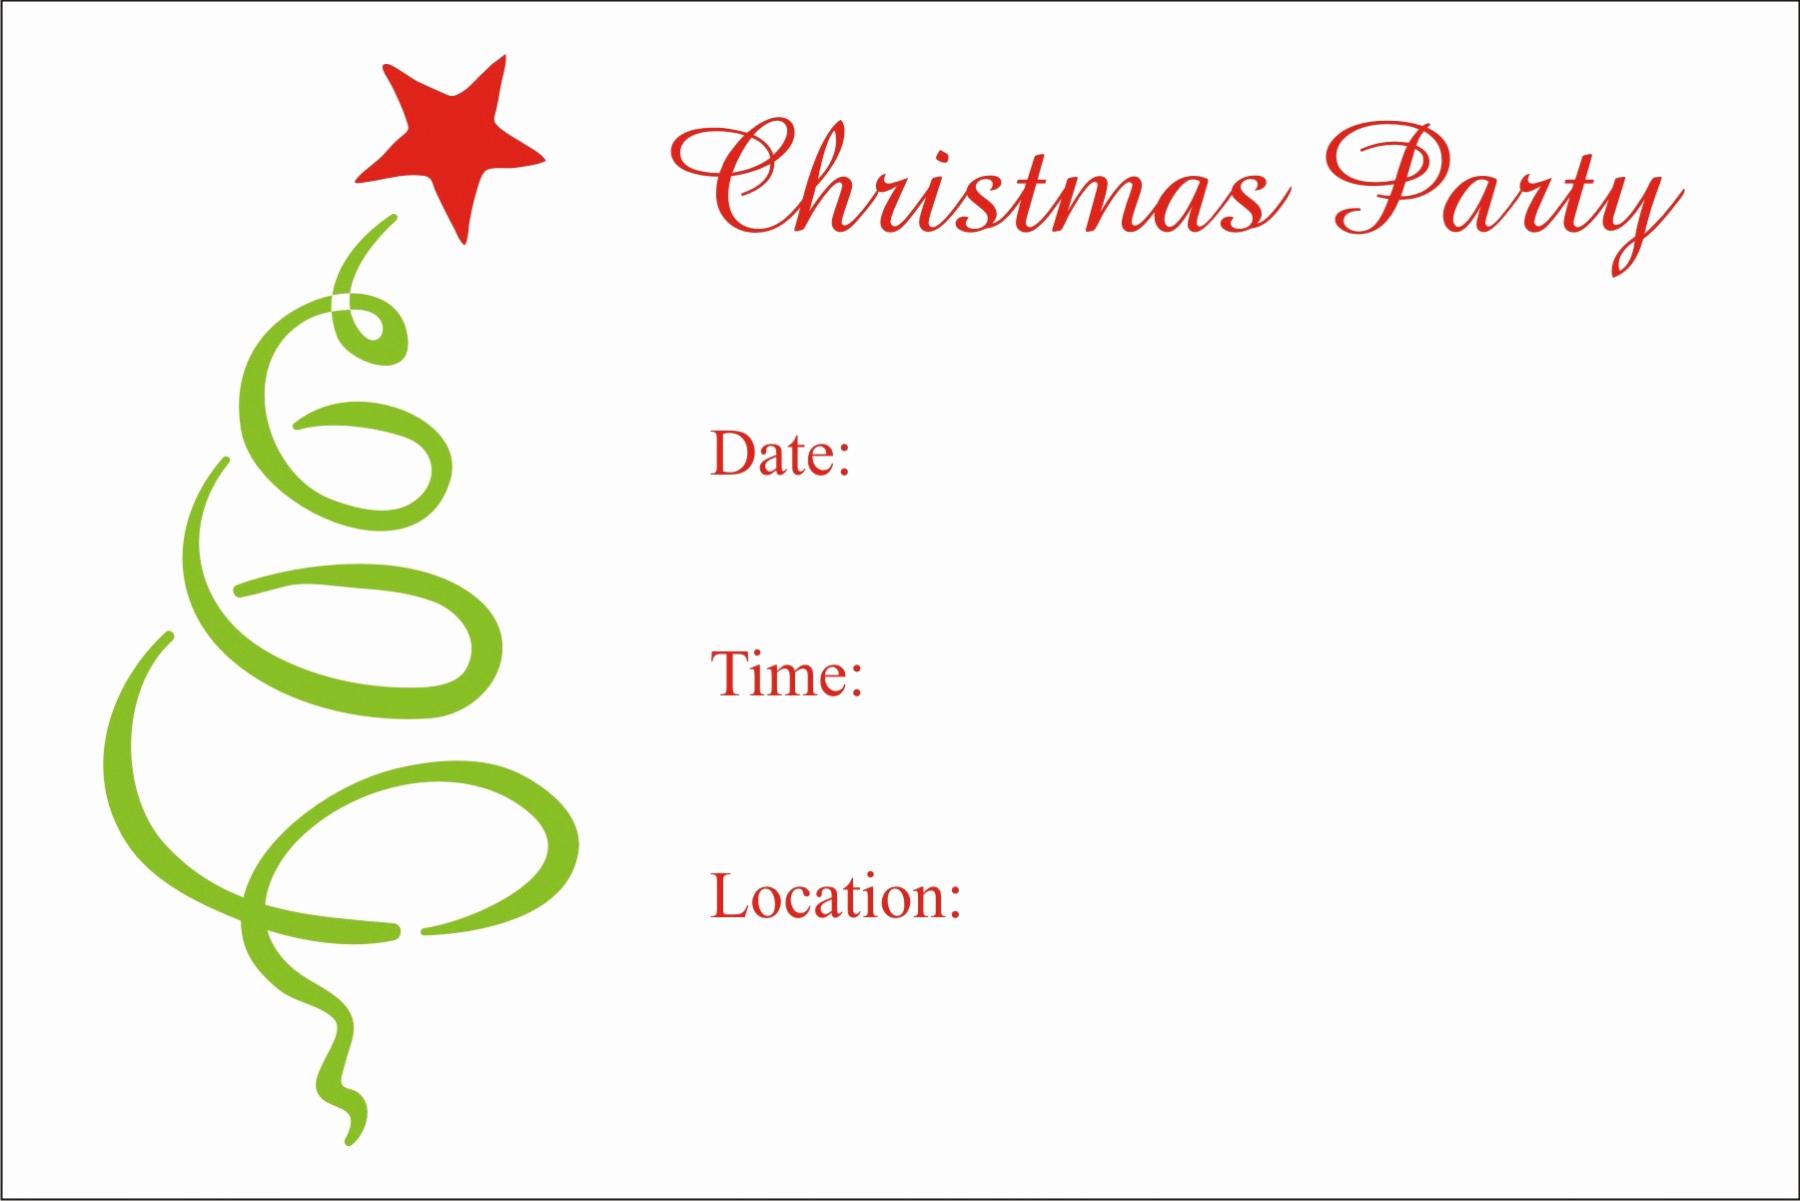 Free Christmas Invitation Templates Elegant Christmas Party Free Printable Holiday Invitation